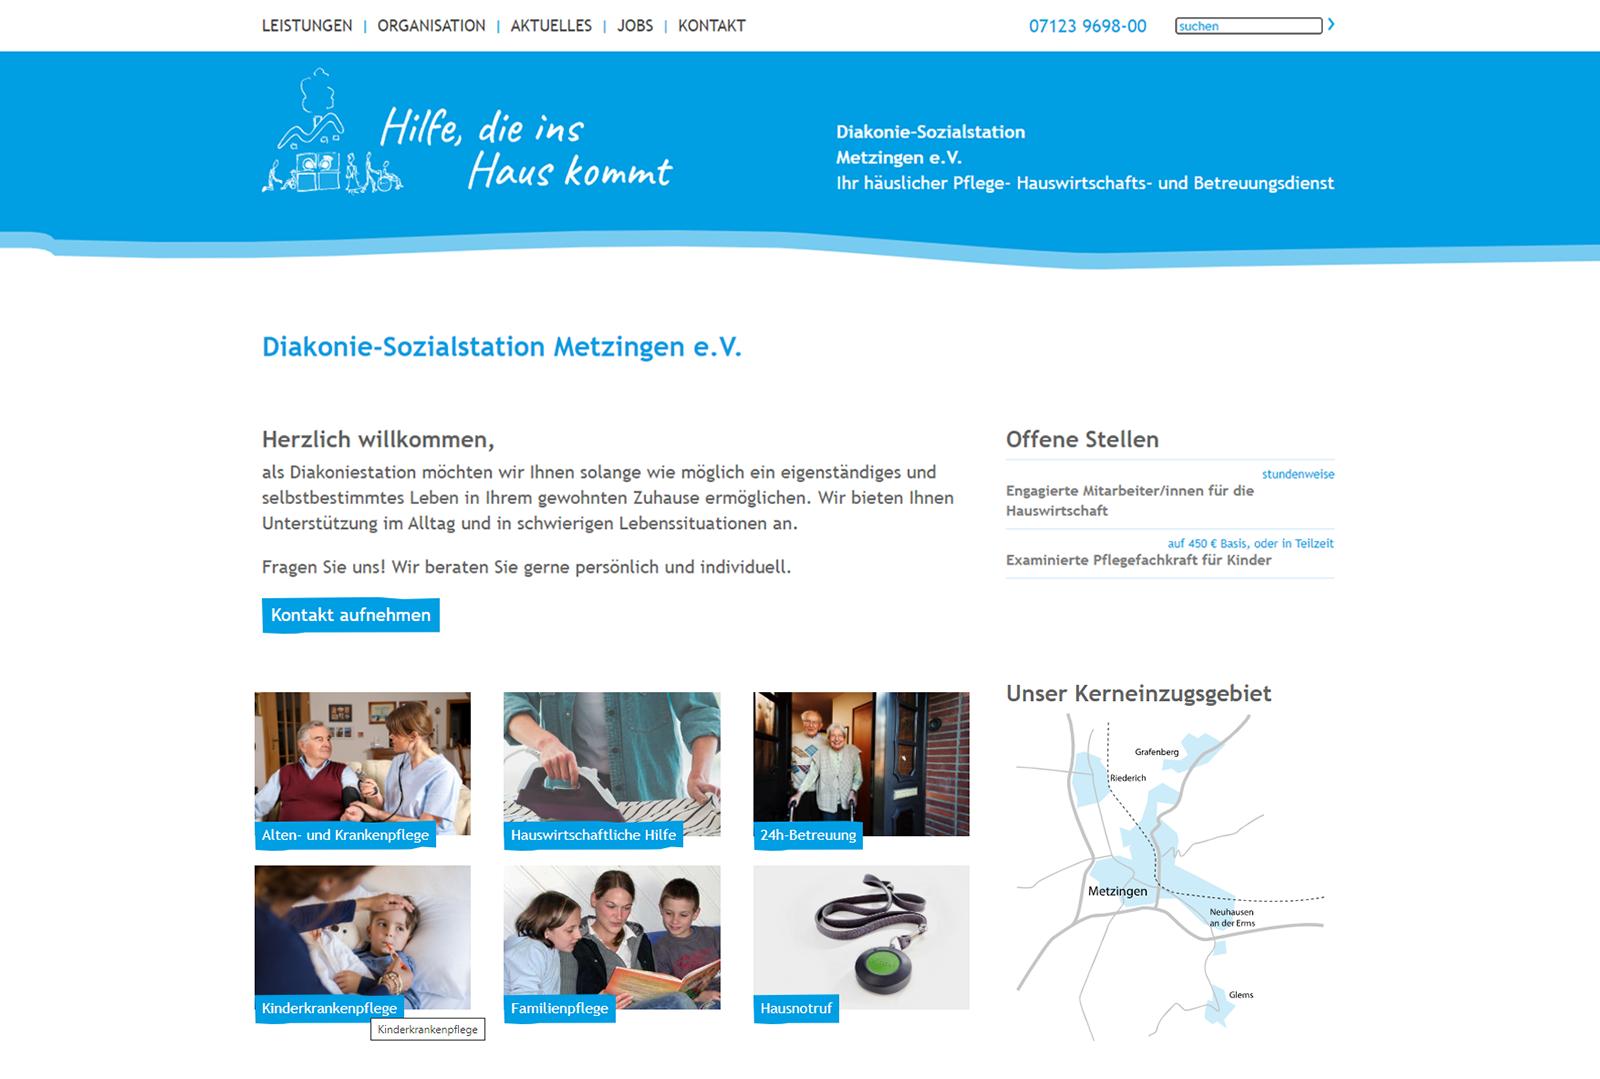 Diakonie-Sozialstation Metzingen Home